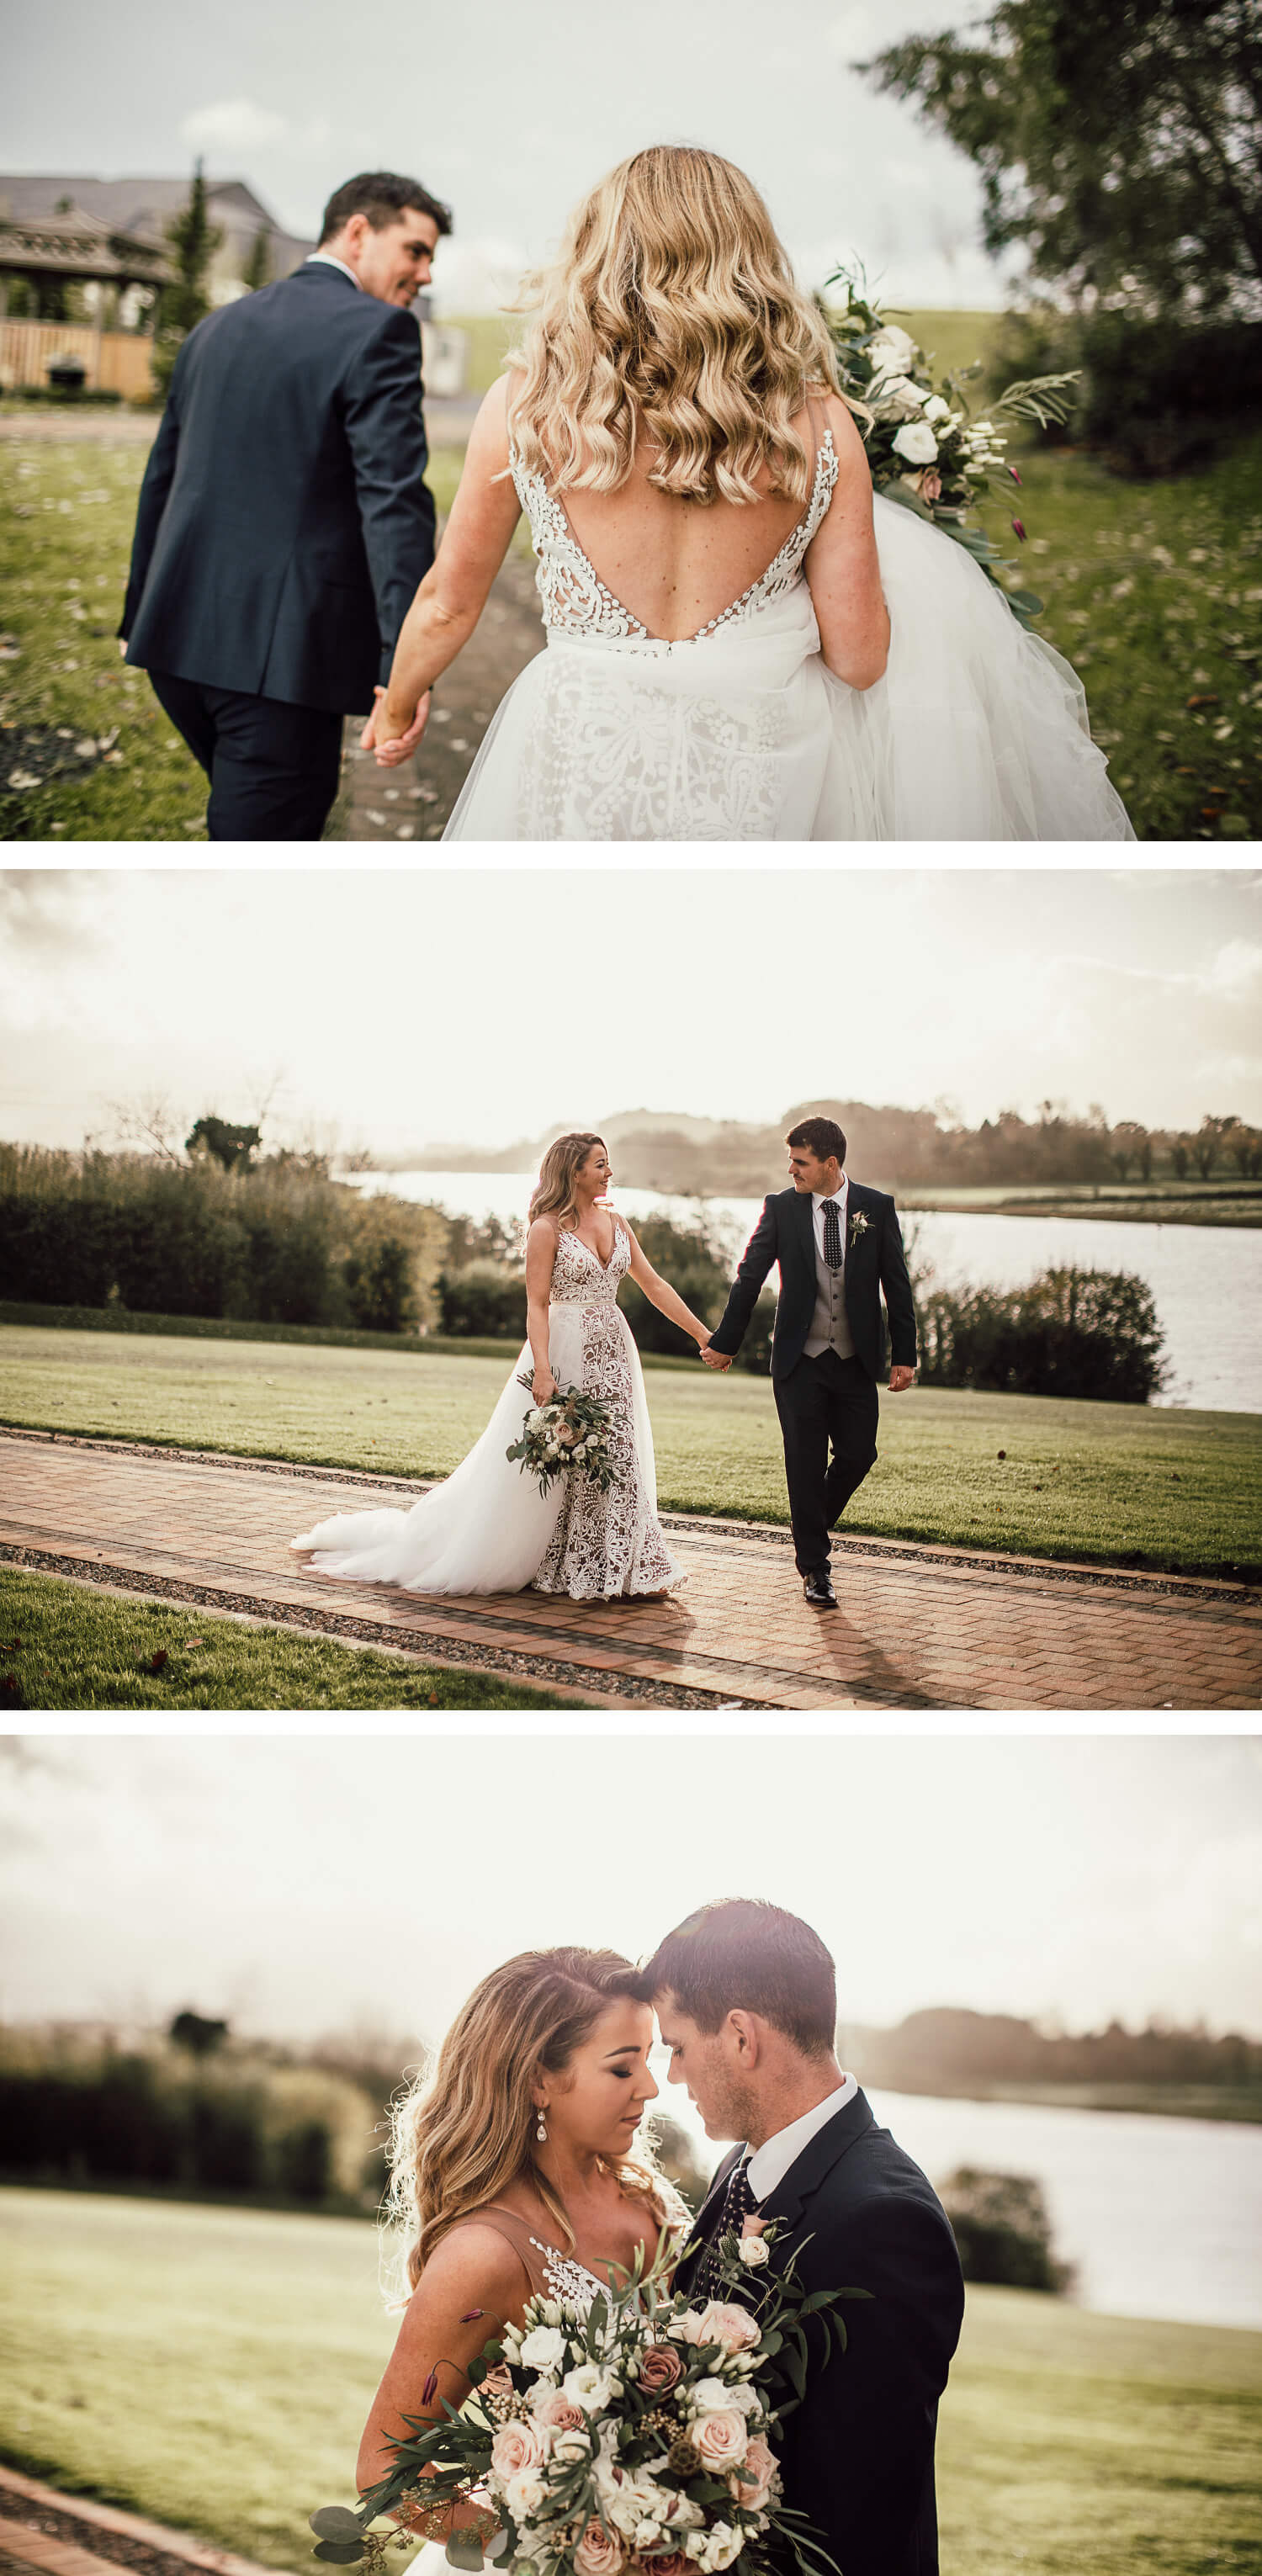 darren-fitzpatrick-photography- killyhevlin-wedding 27